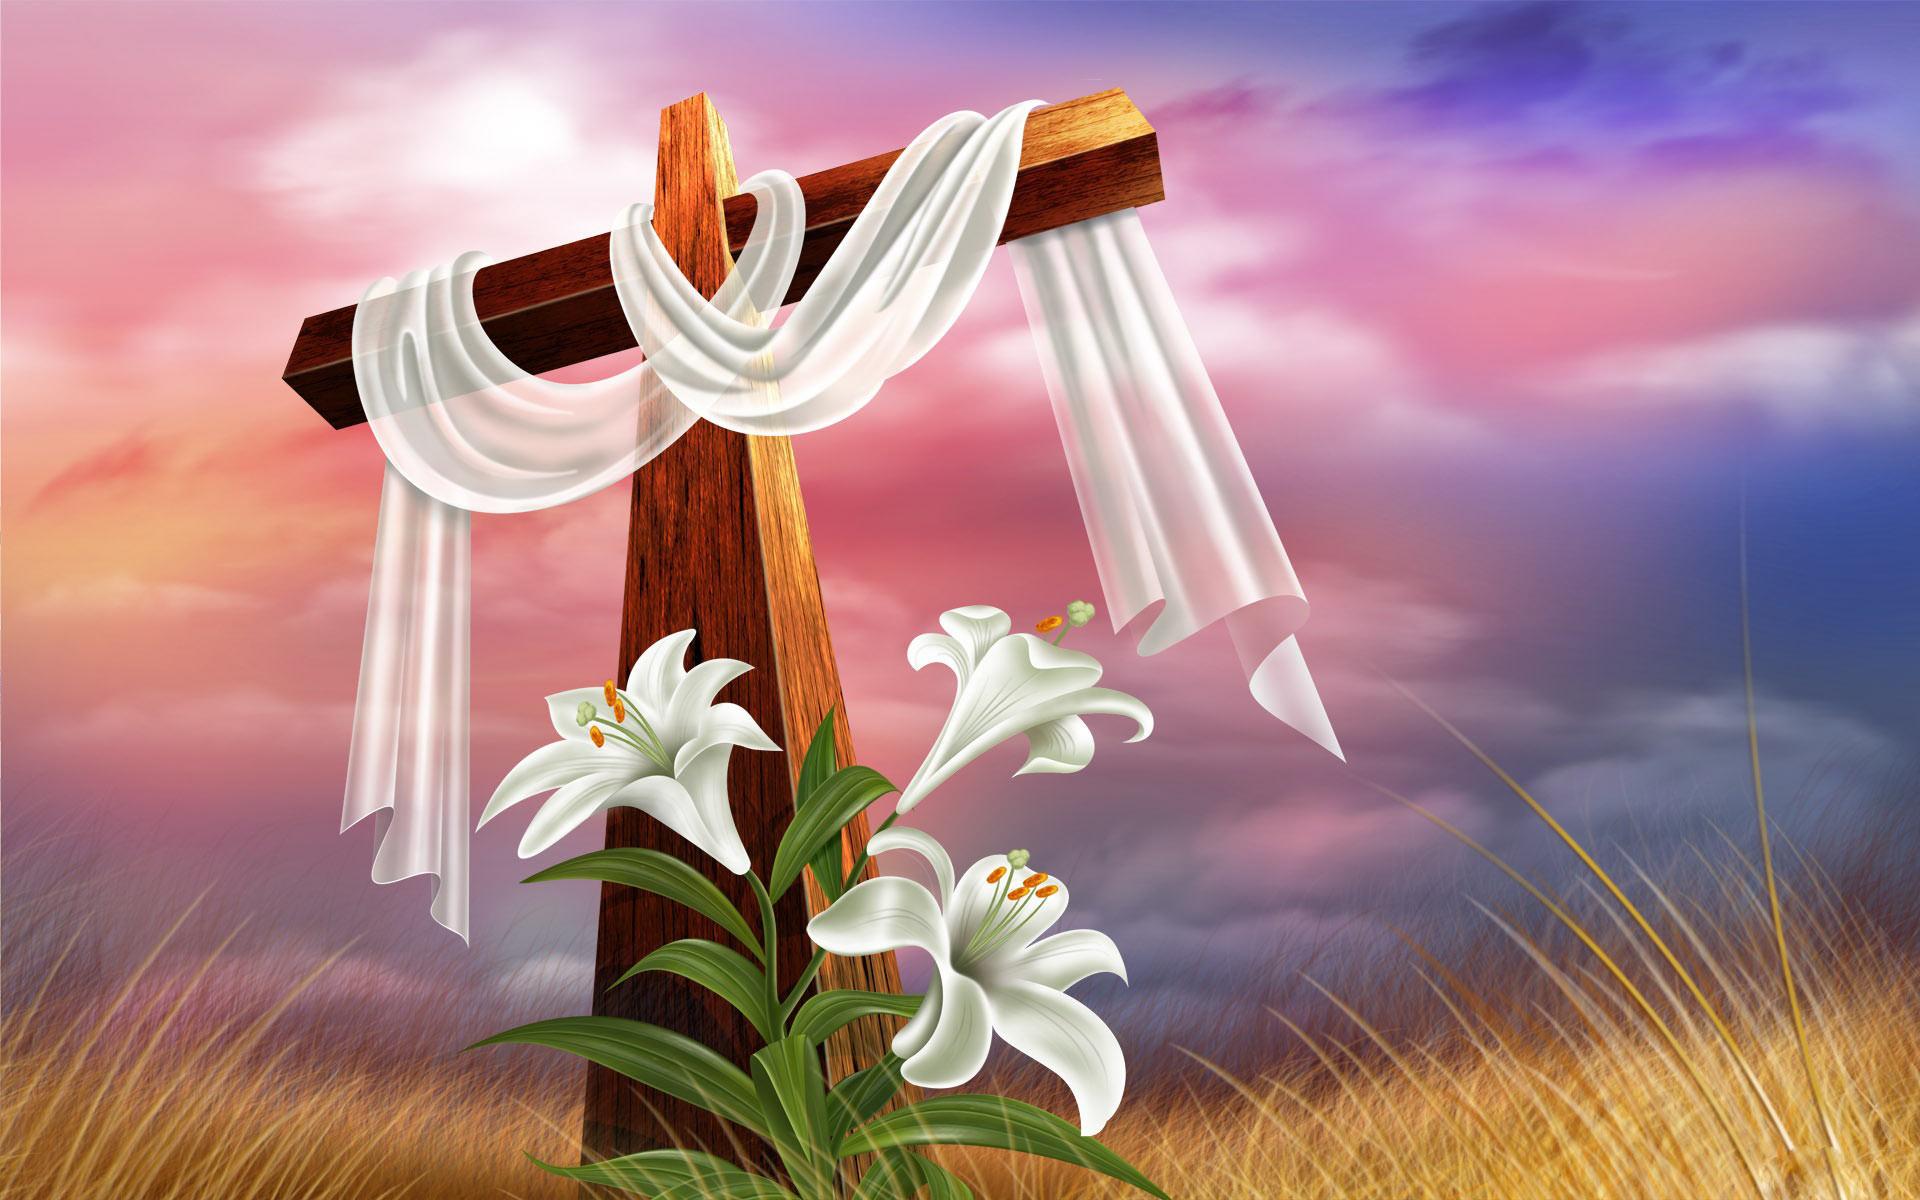 Jesus Hd Wallpaper Widescreen | Wallpaper Hd 1080p Widescreen .